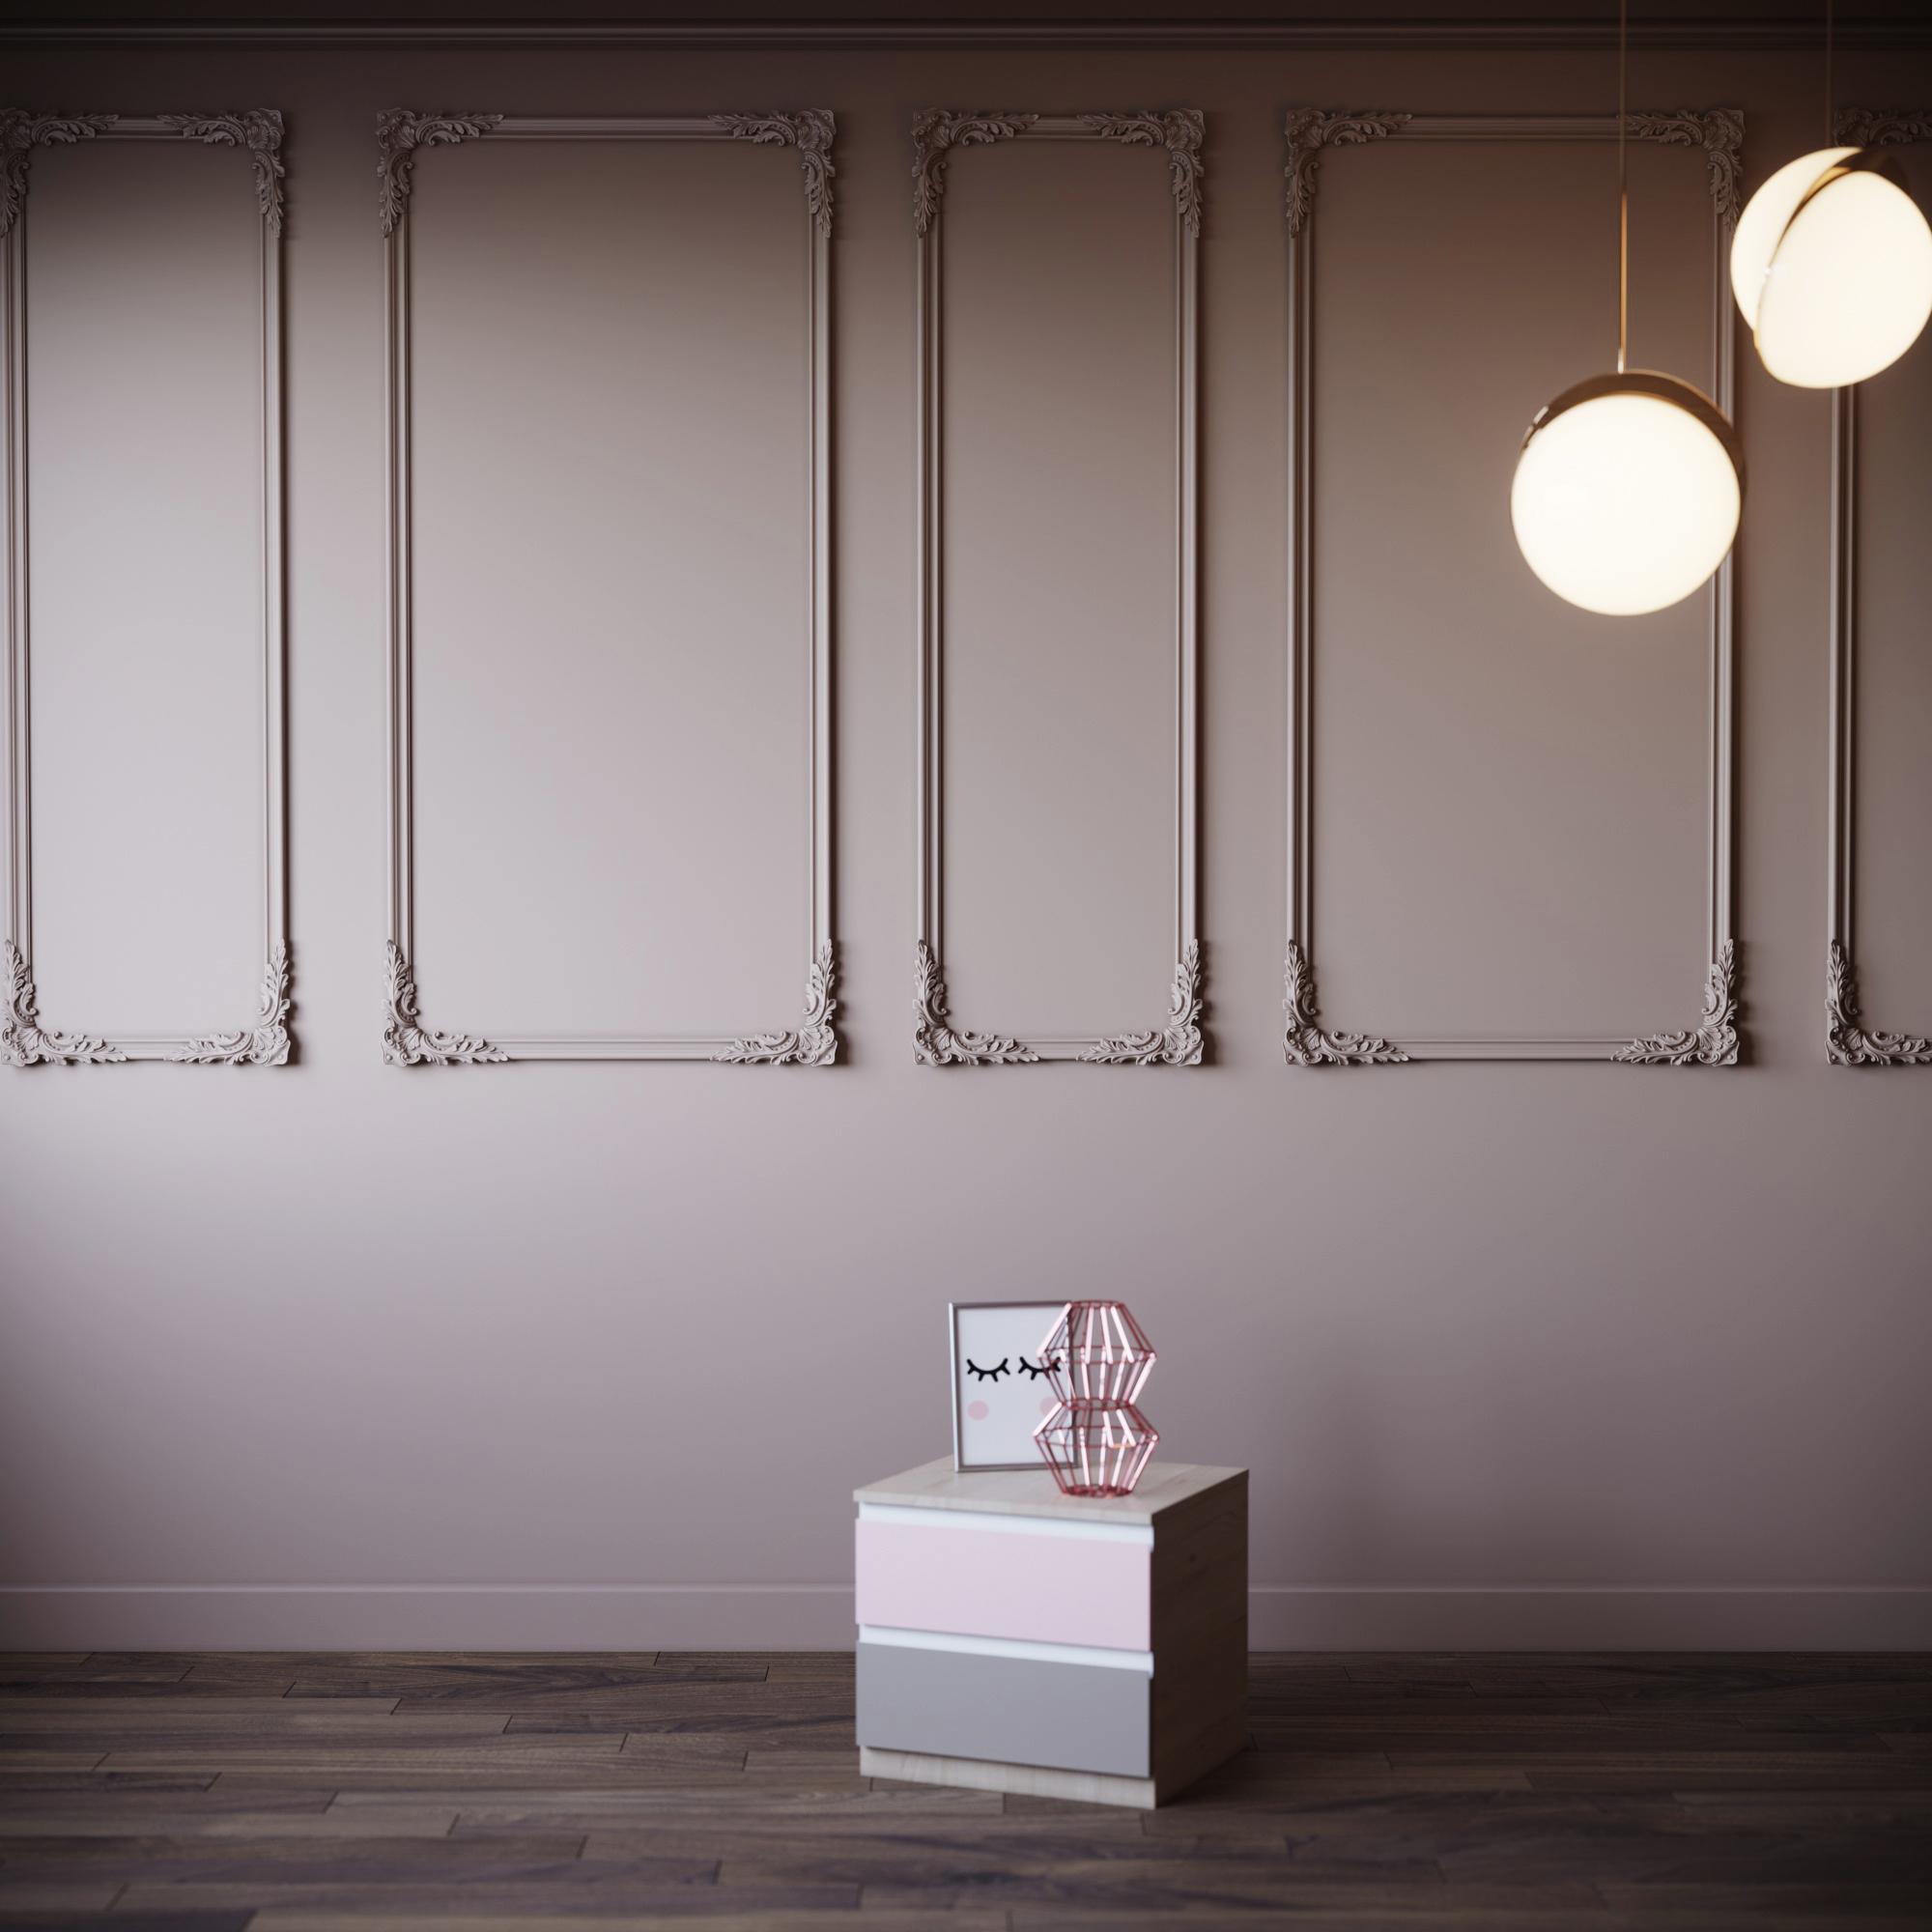 Детская тумба Юнна Сикрет - фабрика мебели Mamka